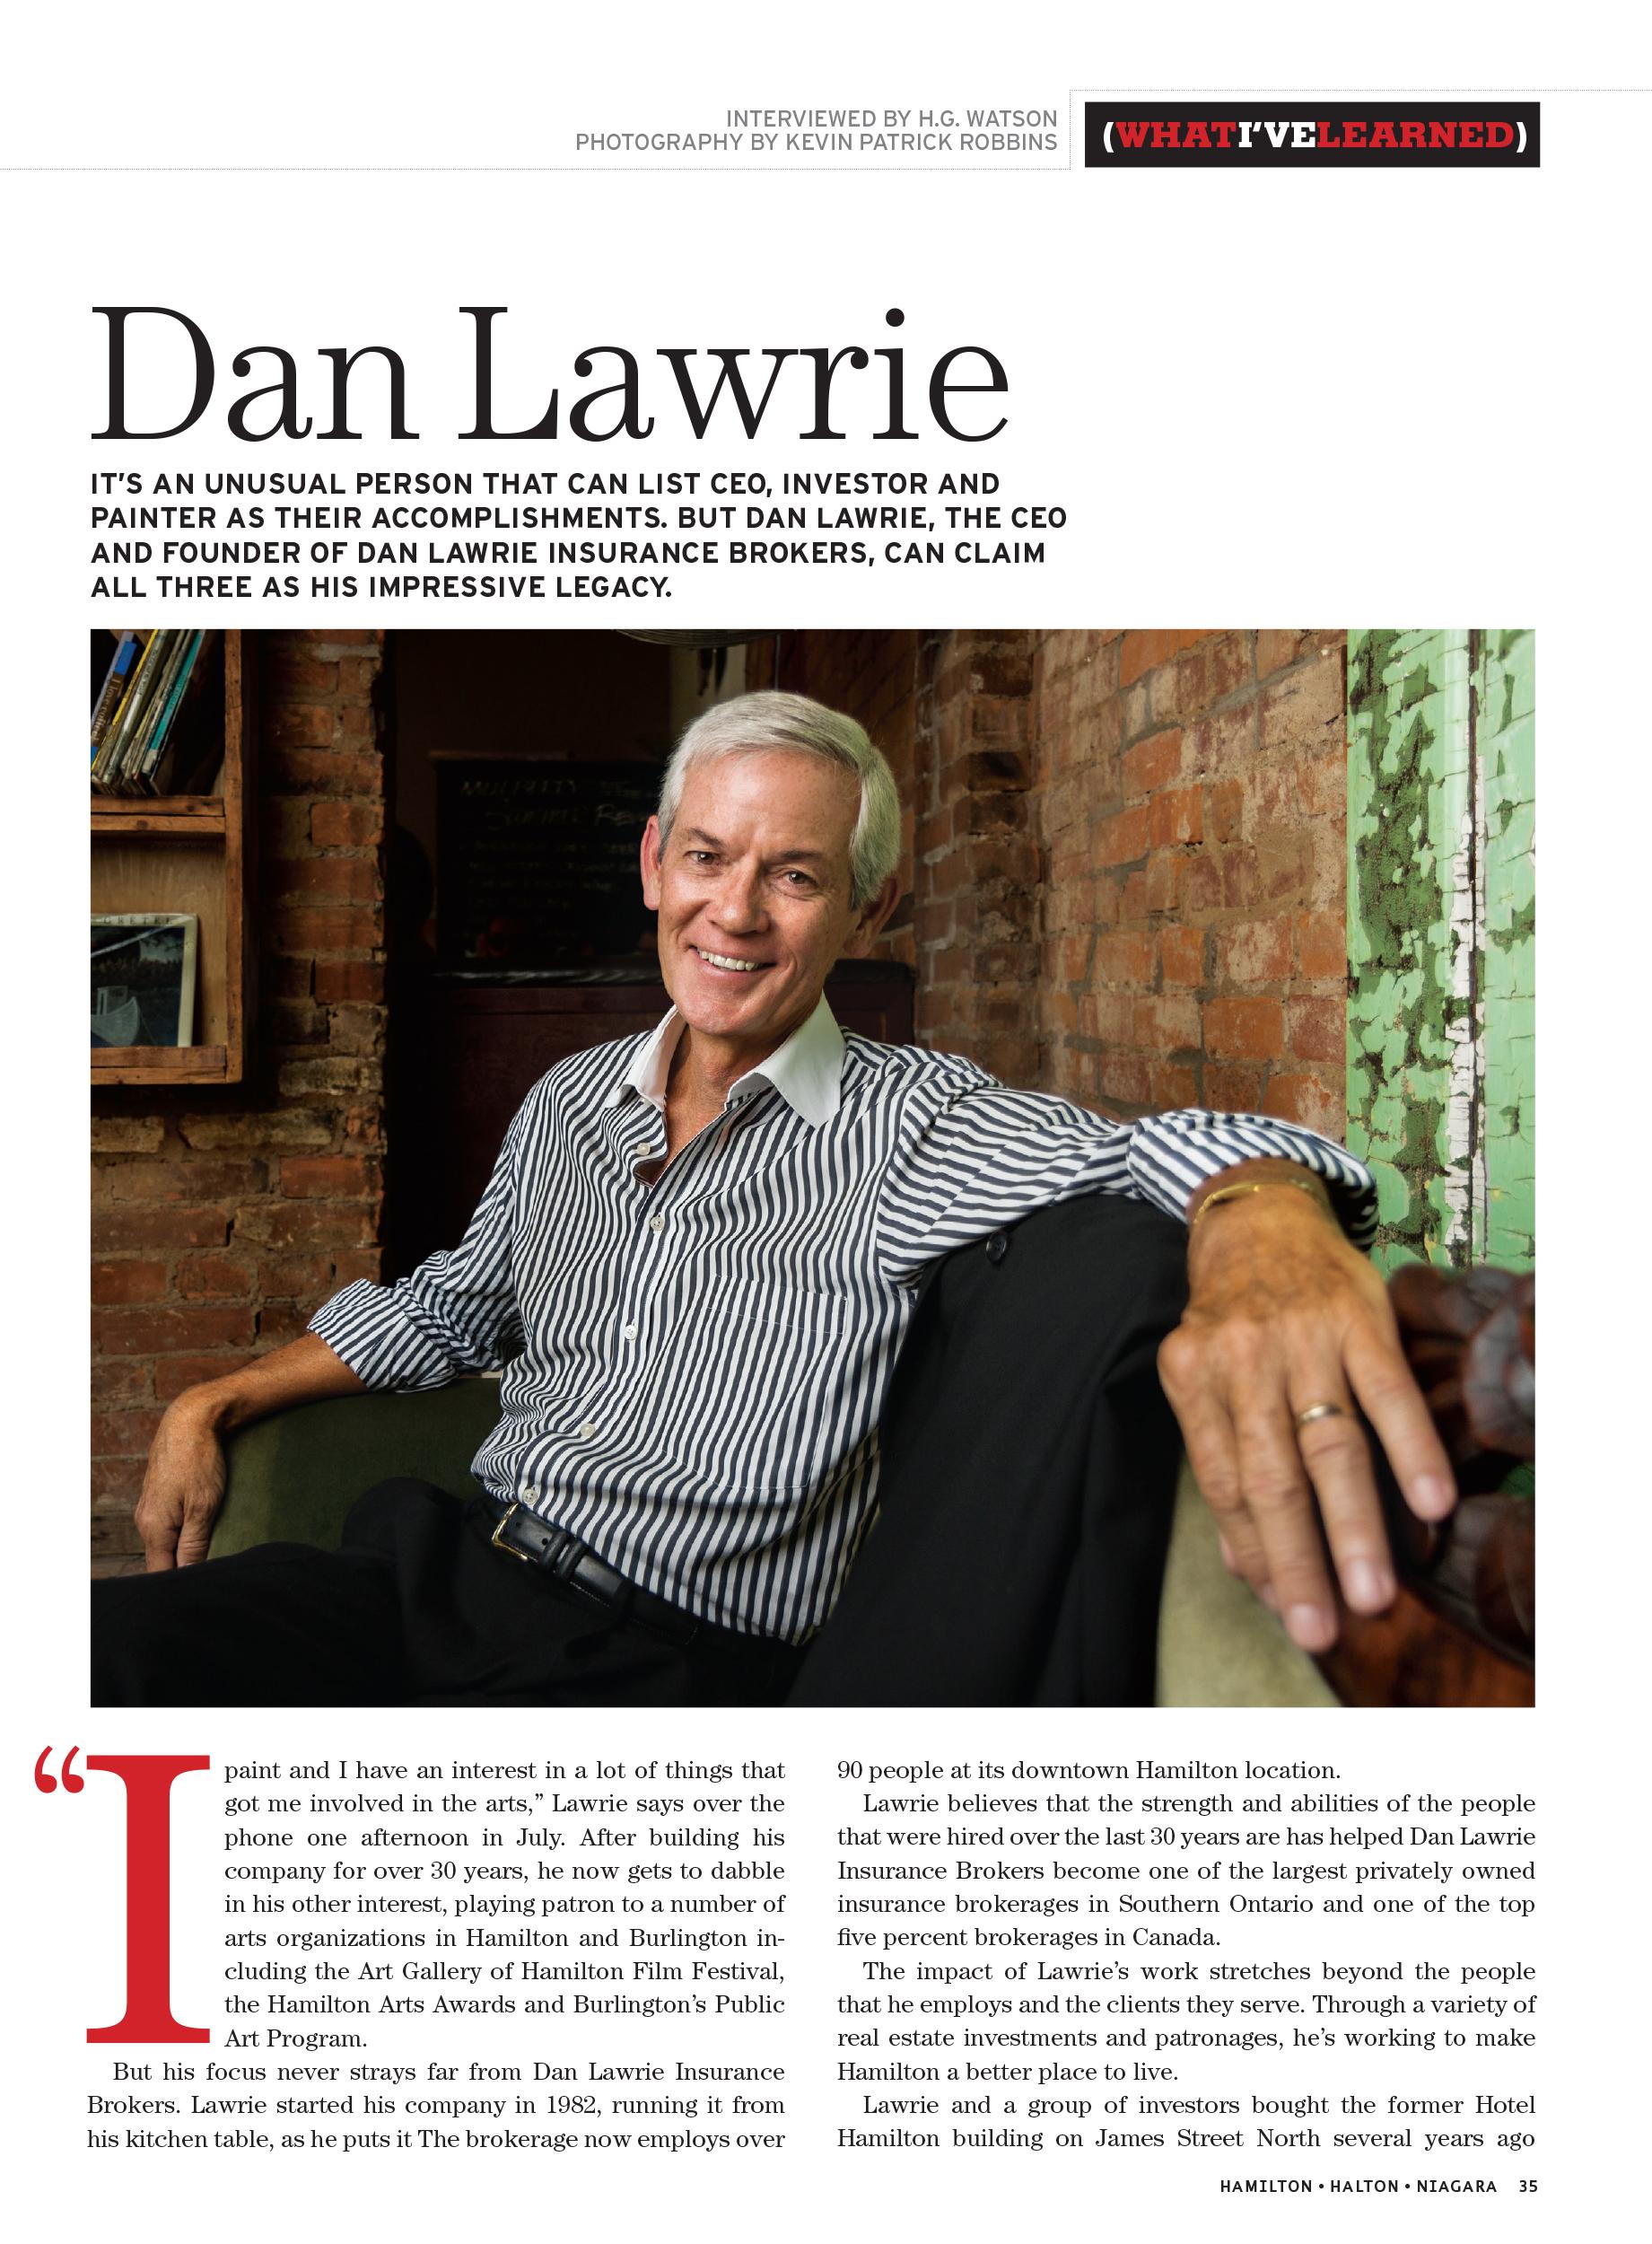 2014-03-02-Toronto-Ontario-Canada-editorial-photography-portrait-business-insurance-executive-Dan-Lawrie-Biz-magazine-feature-by-Kevin-Patrick-Robbins-KPR.jpg